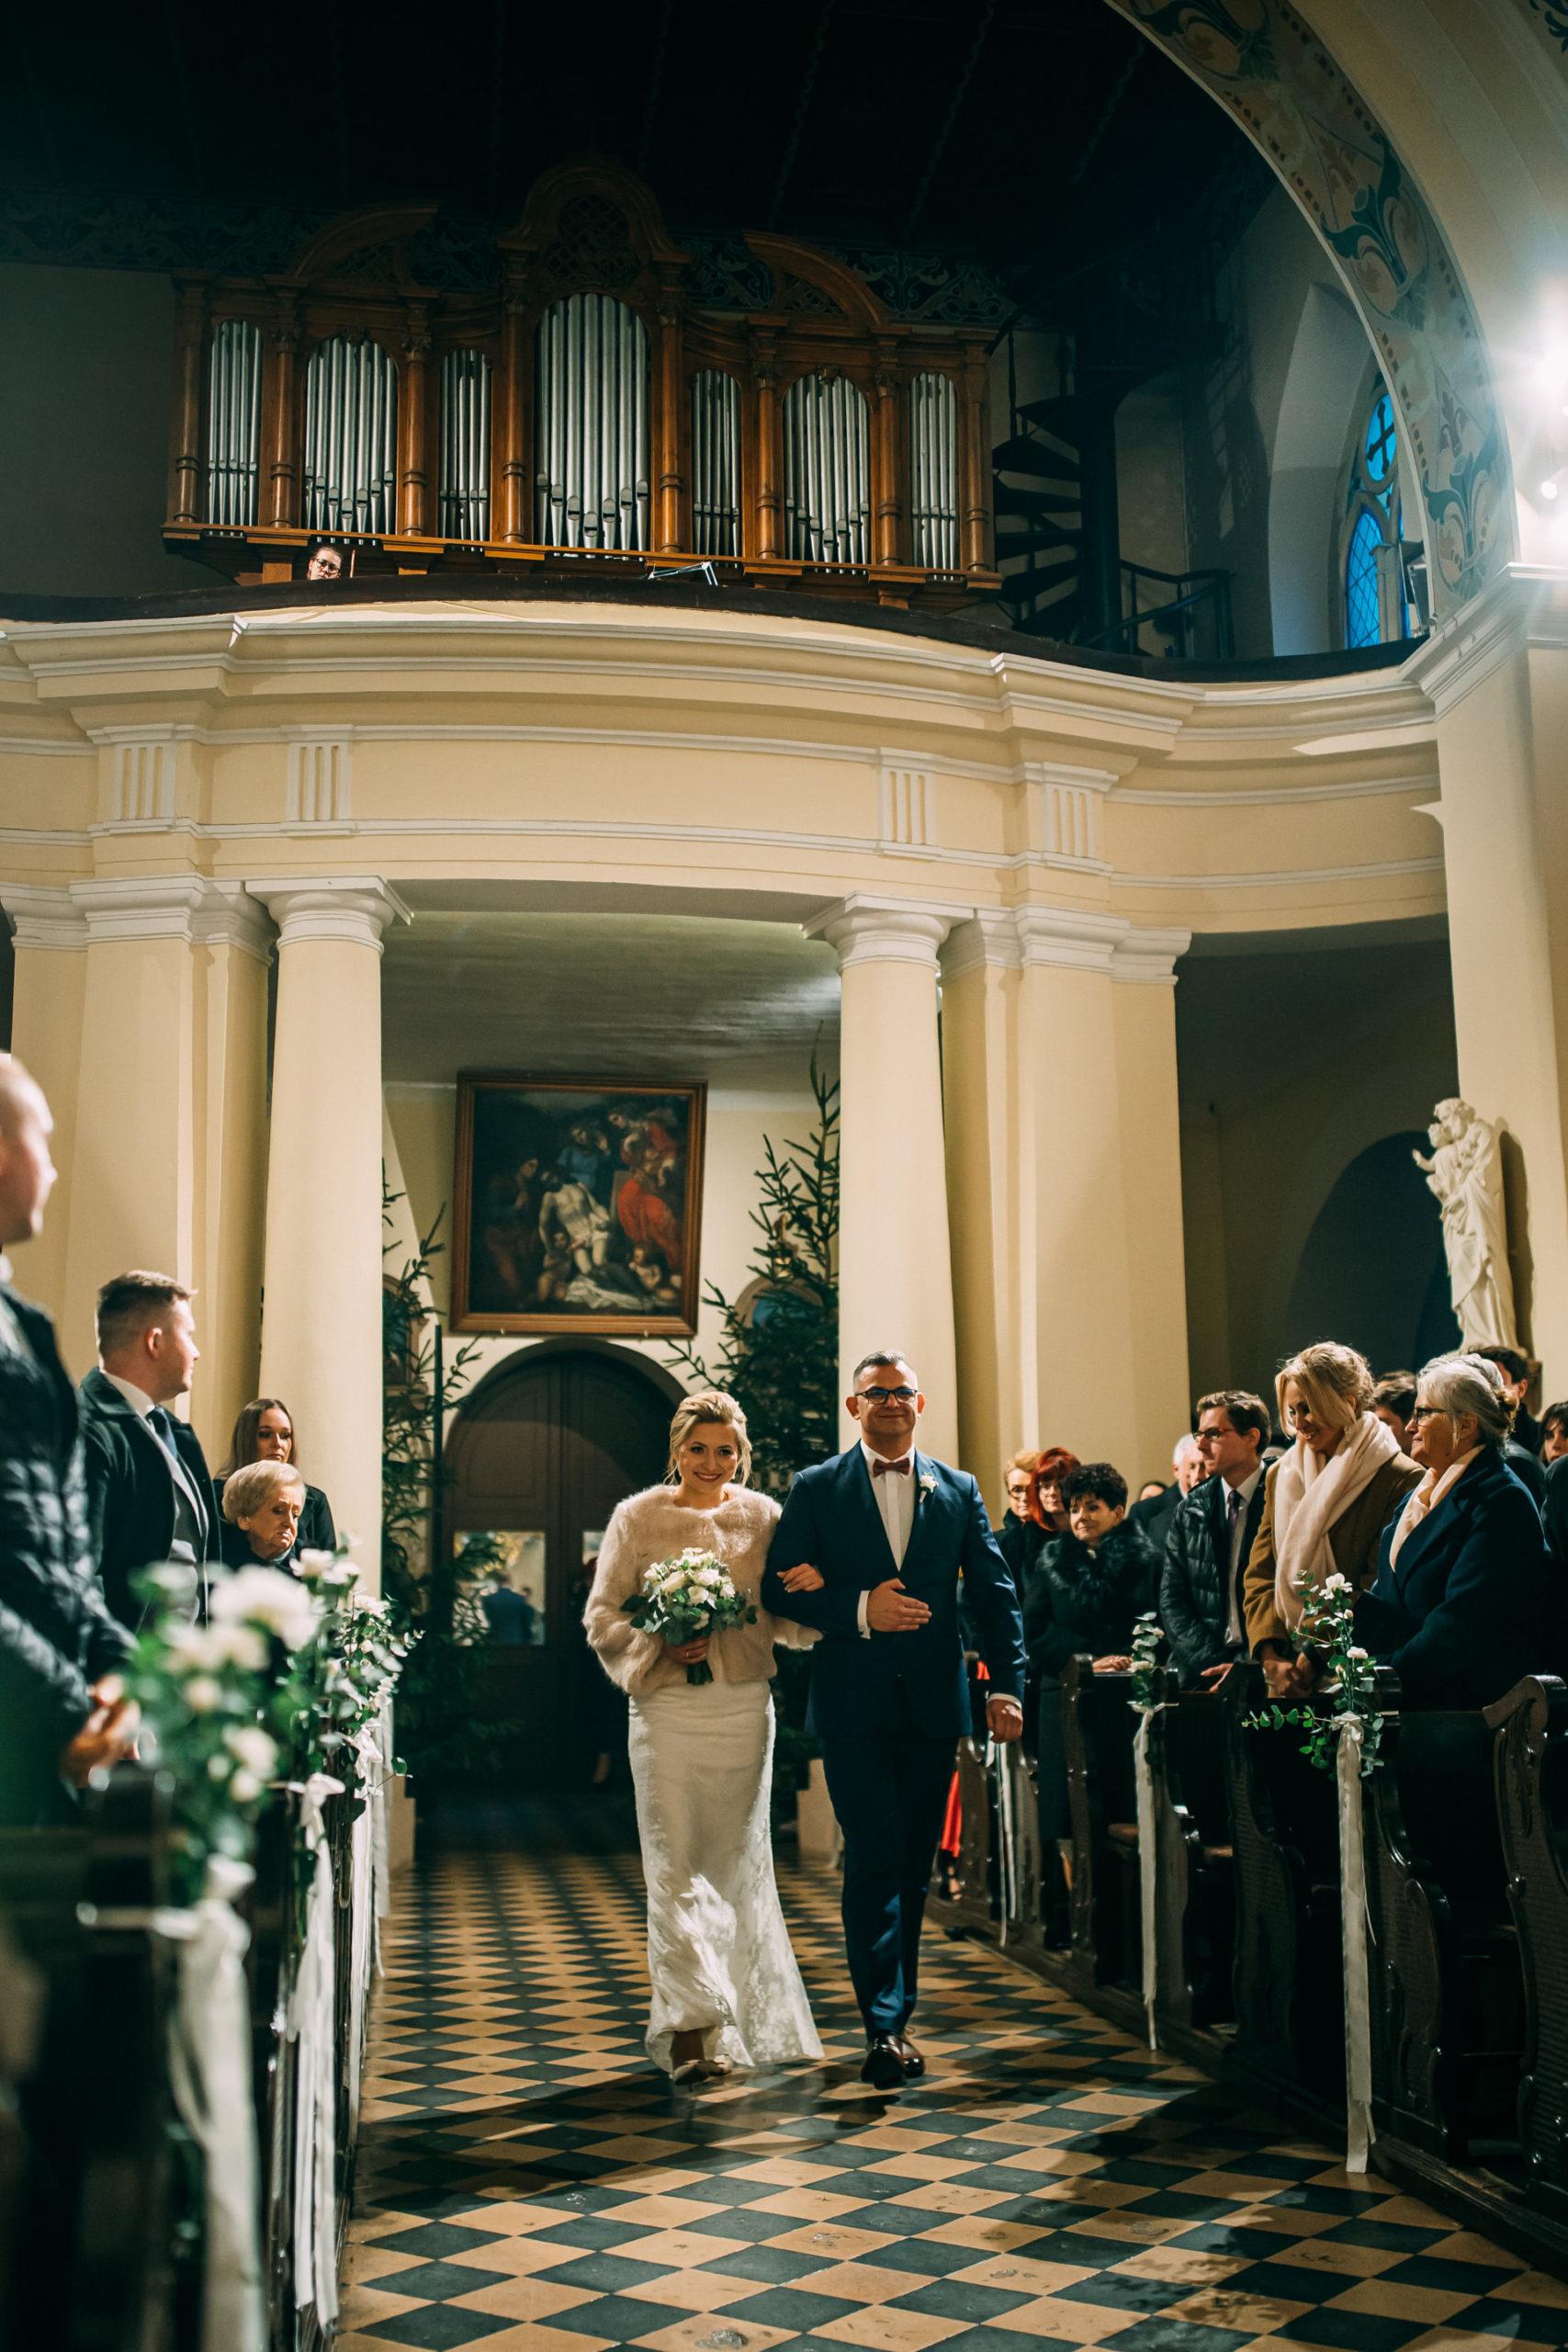 Wejście do kościoła Pani Młodej Reportaż ślubny Love Needs